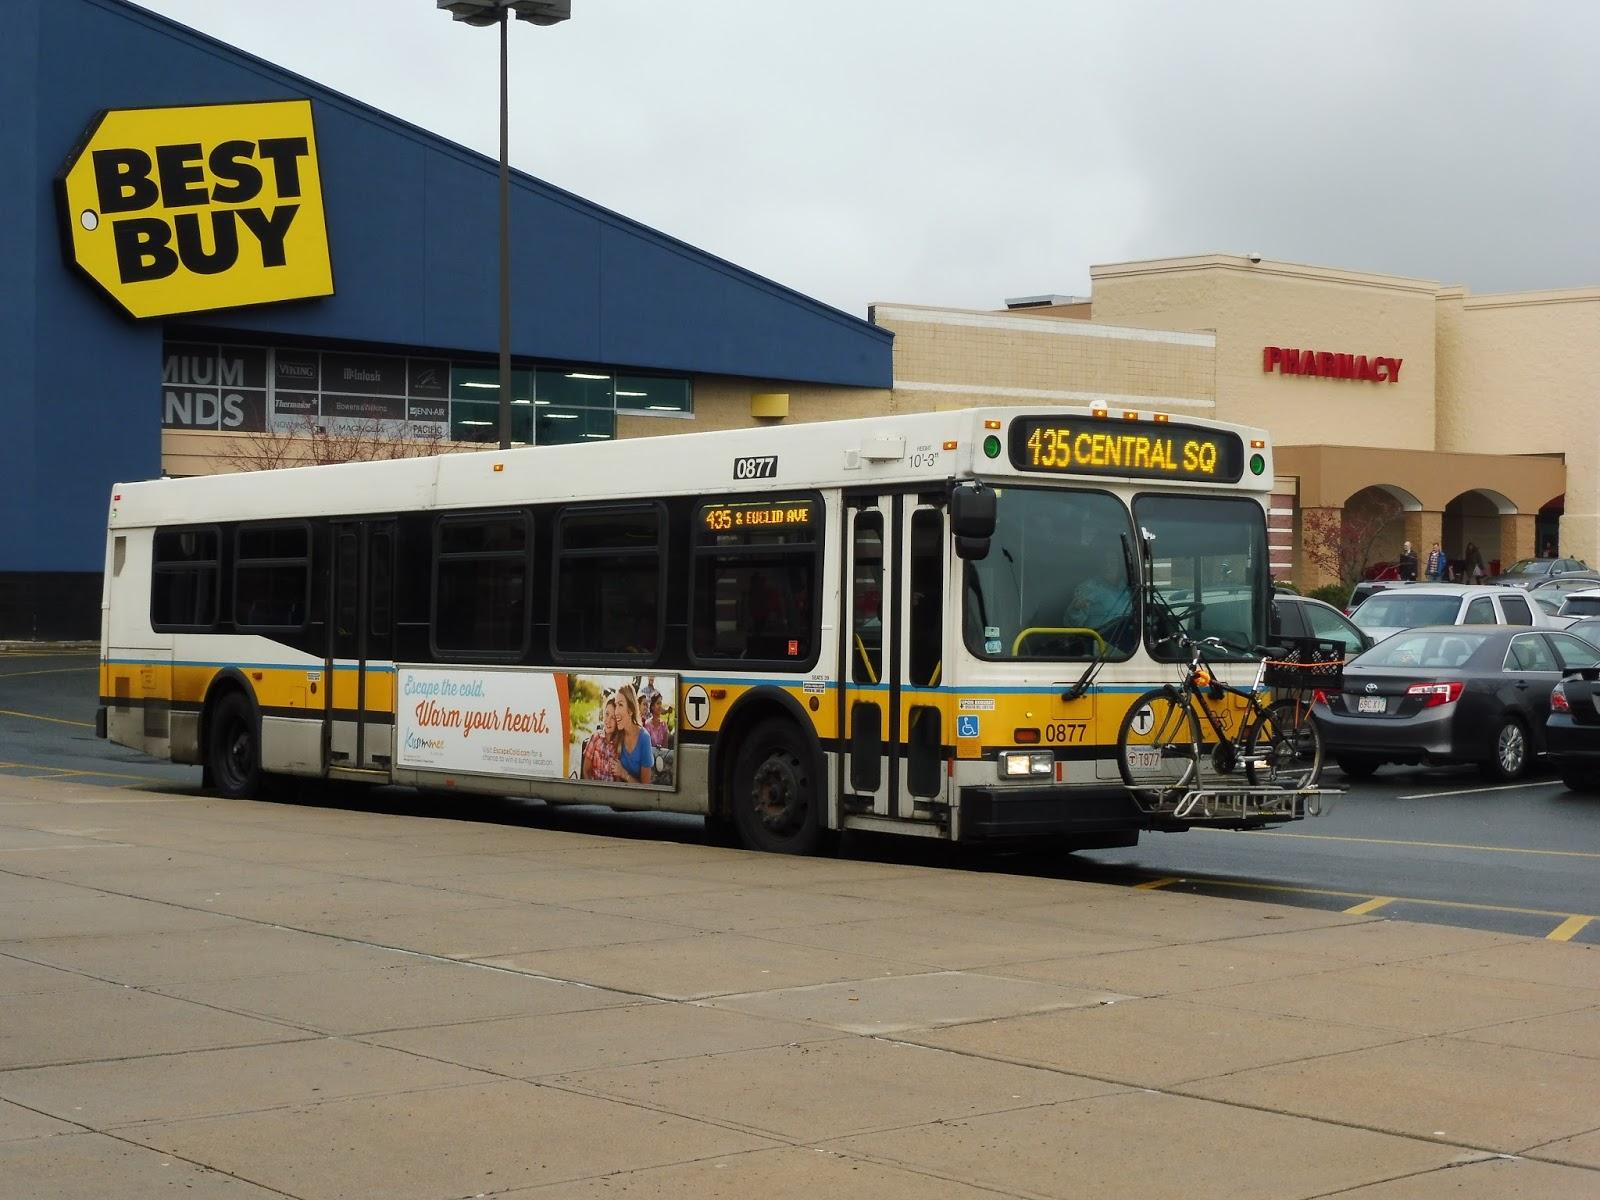 miles on the mbta: 435 (liberty tree mall - central square, lynn via